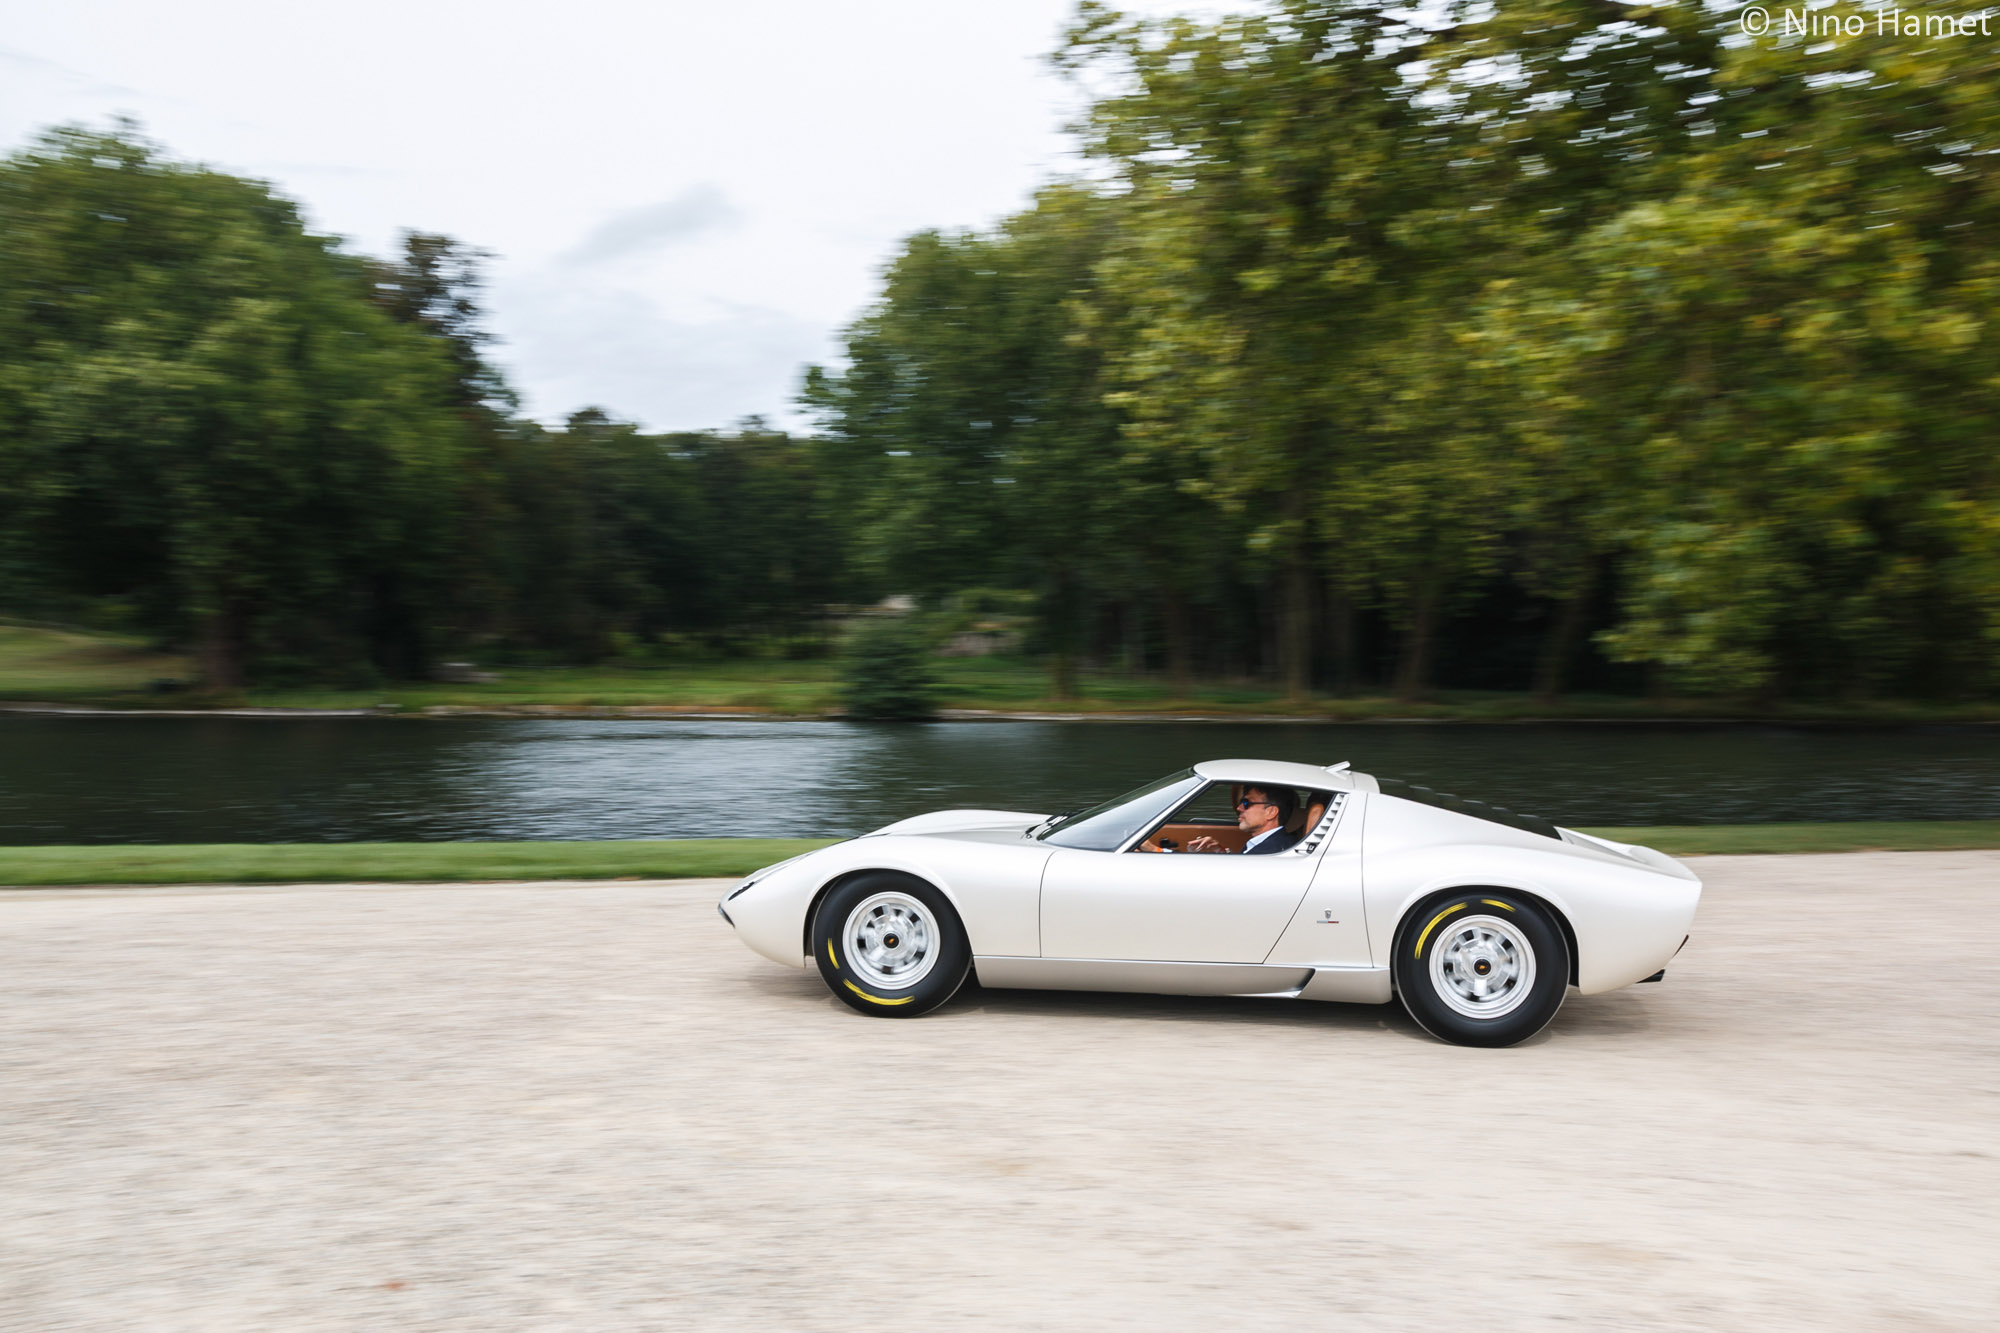 "Cinquantenaire de la Lamborghini Miura P400 (Salon de Genève 1966), prix spécial du Jury : Lamborghini Miura ''Prototype"" 1966 (Collection Caveng)"